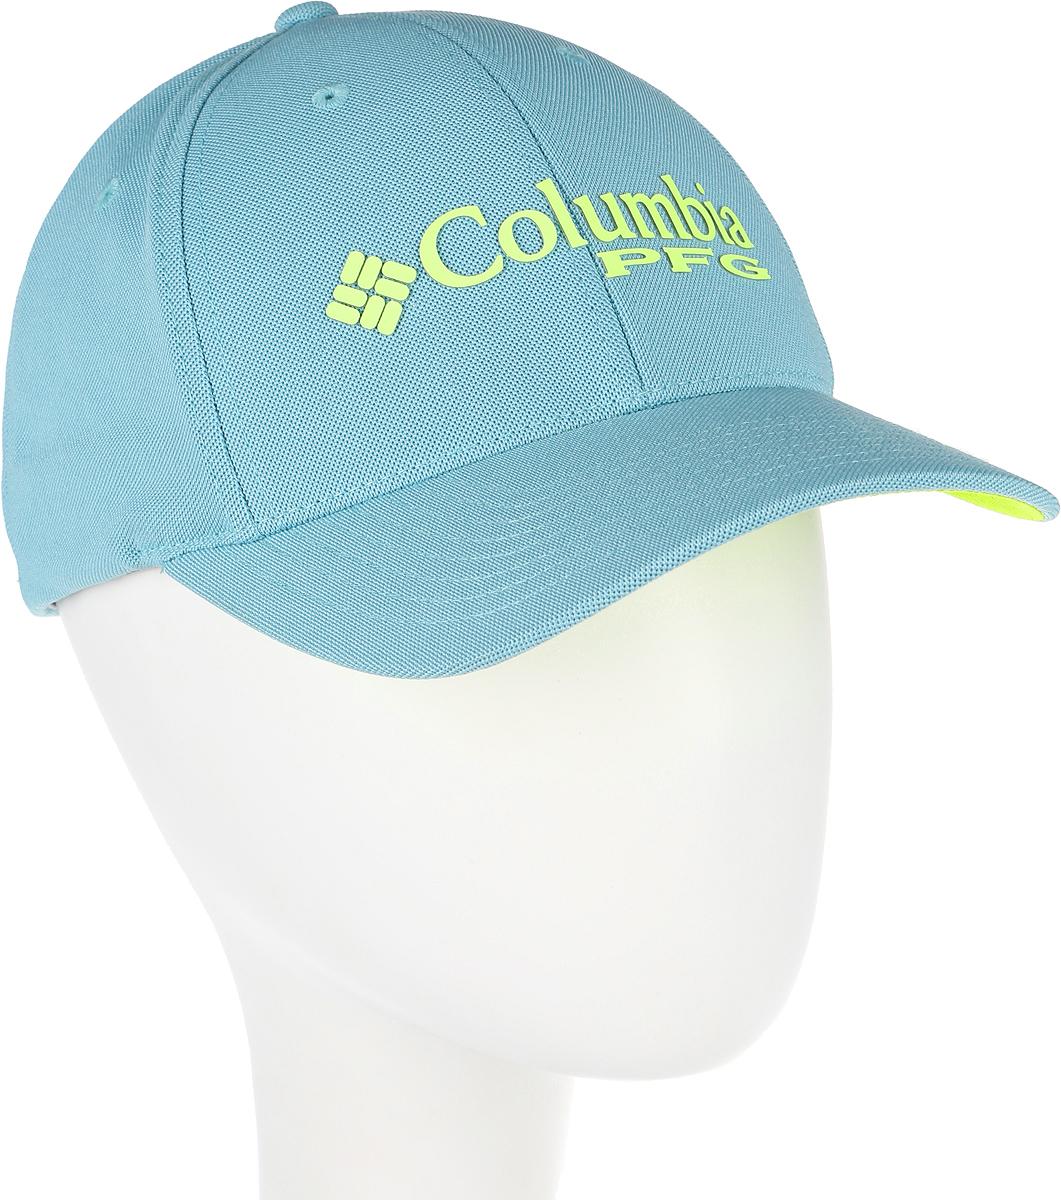 Бейсболка Columbia PFG Mesh Pique Ballcap, цвет: голубой. 1577481-909. Размер S/M (56/57)